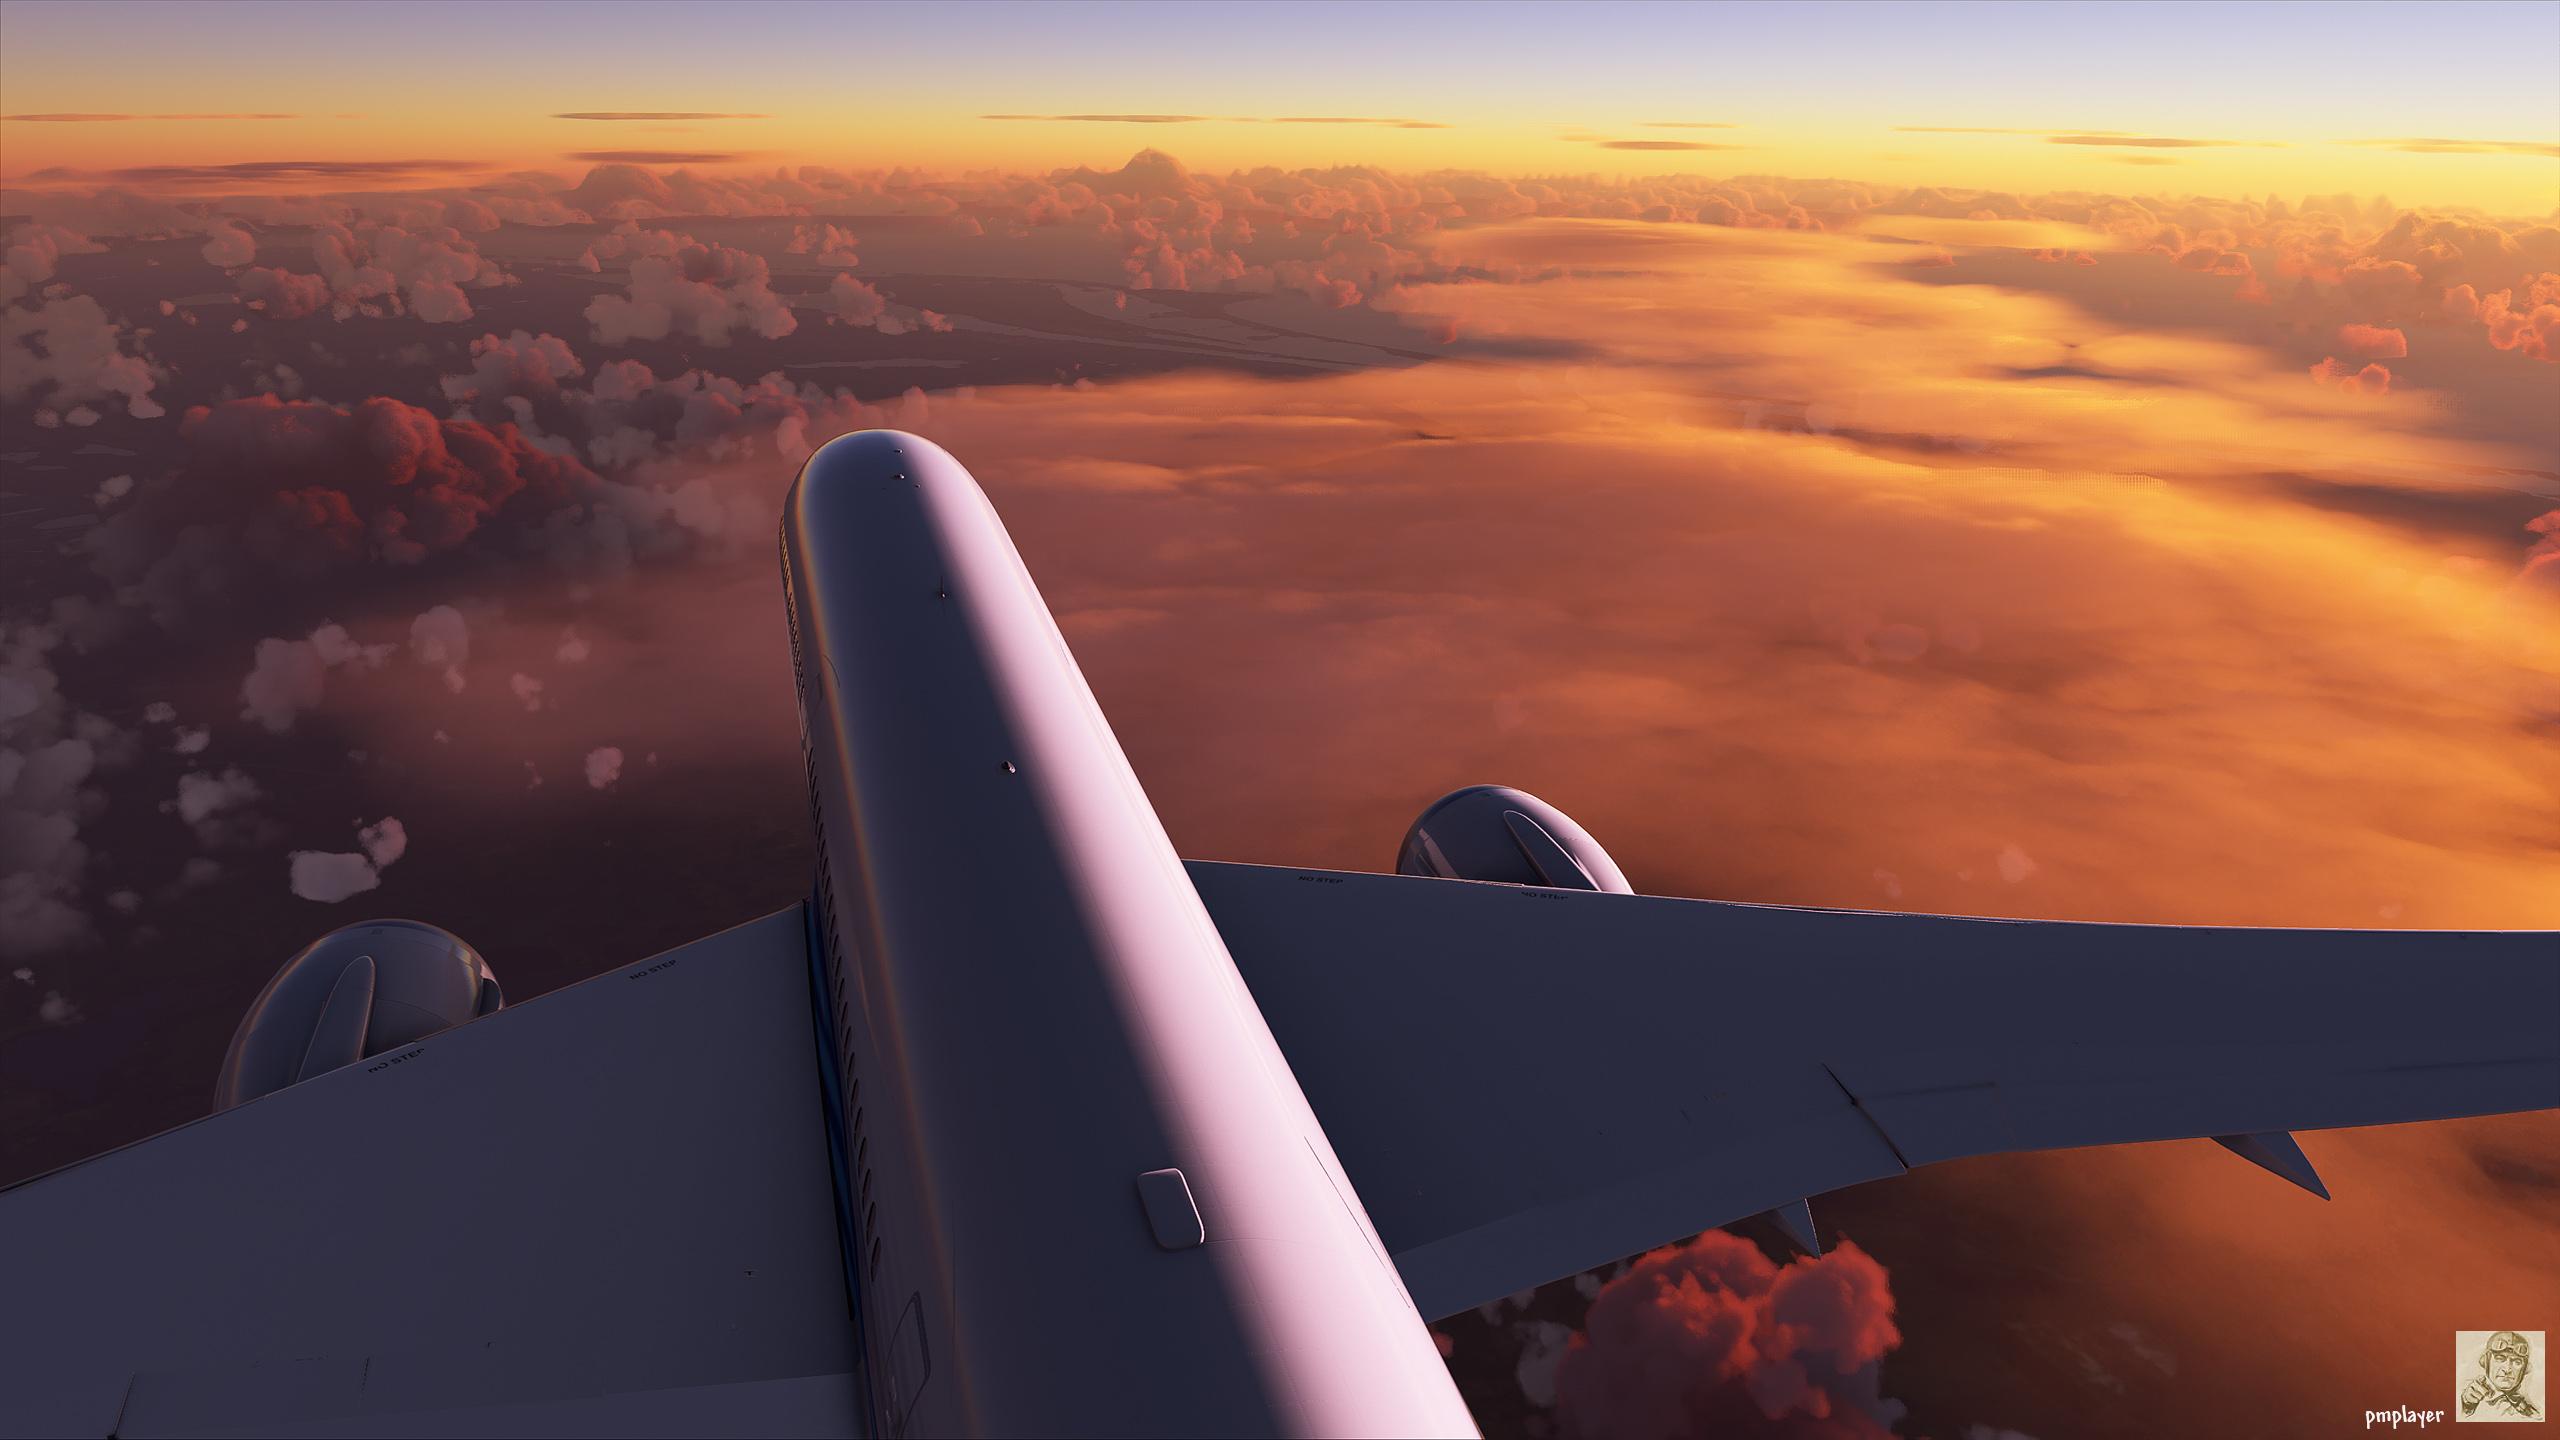 787-10onupcomingsun_19fjot.jpg